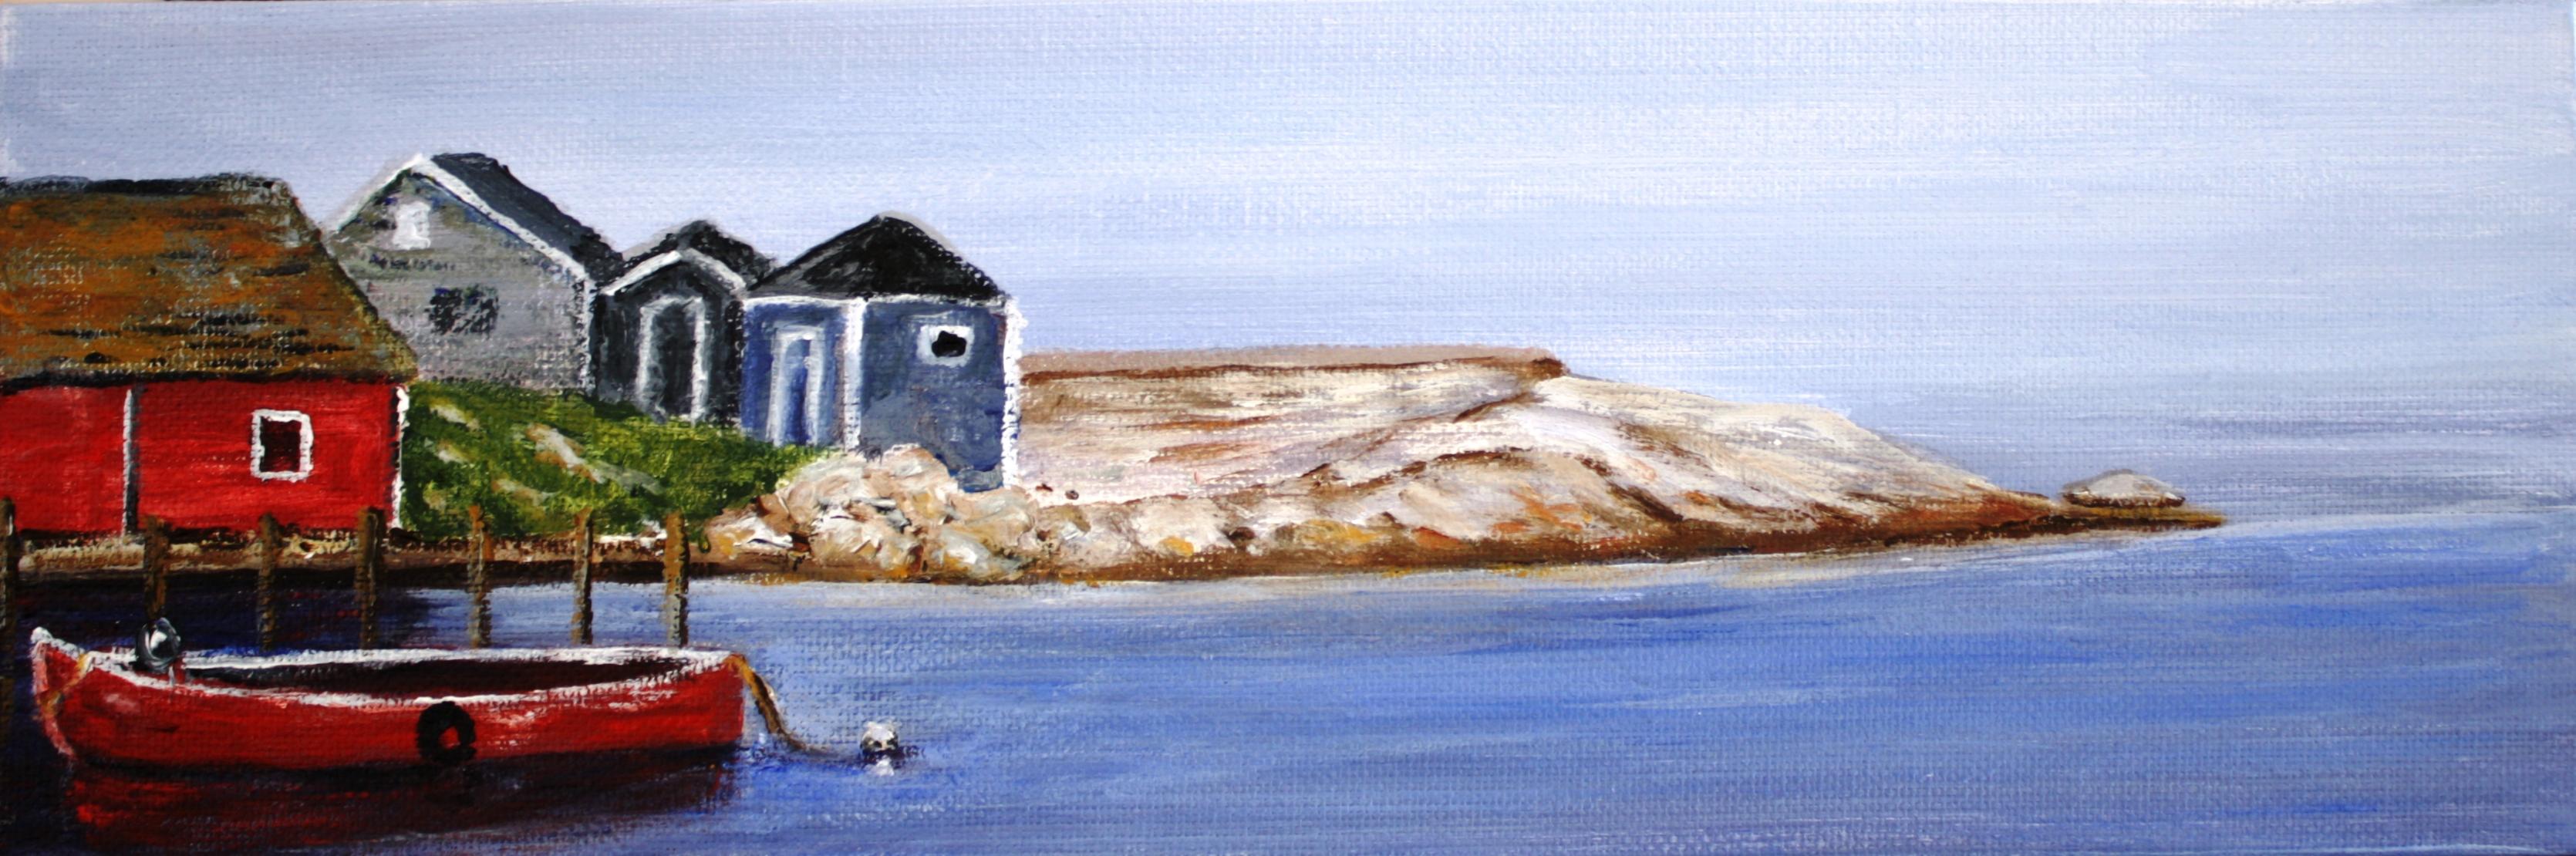 Peggy's Cove, Nova Scotia Artist, acrylic paitning, landscape